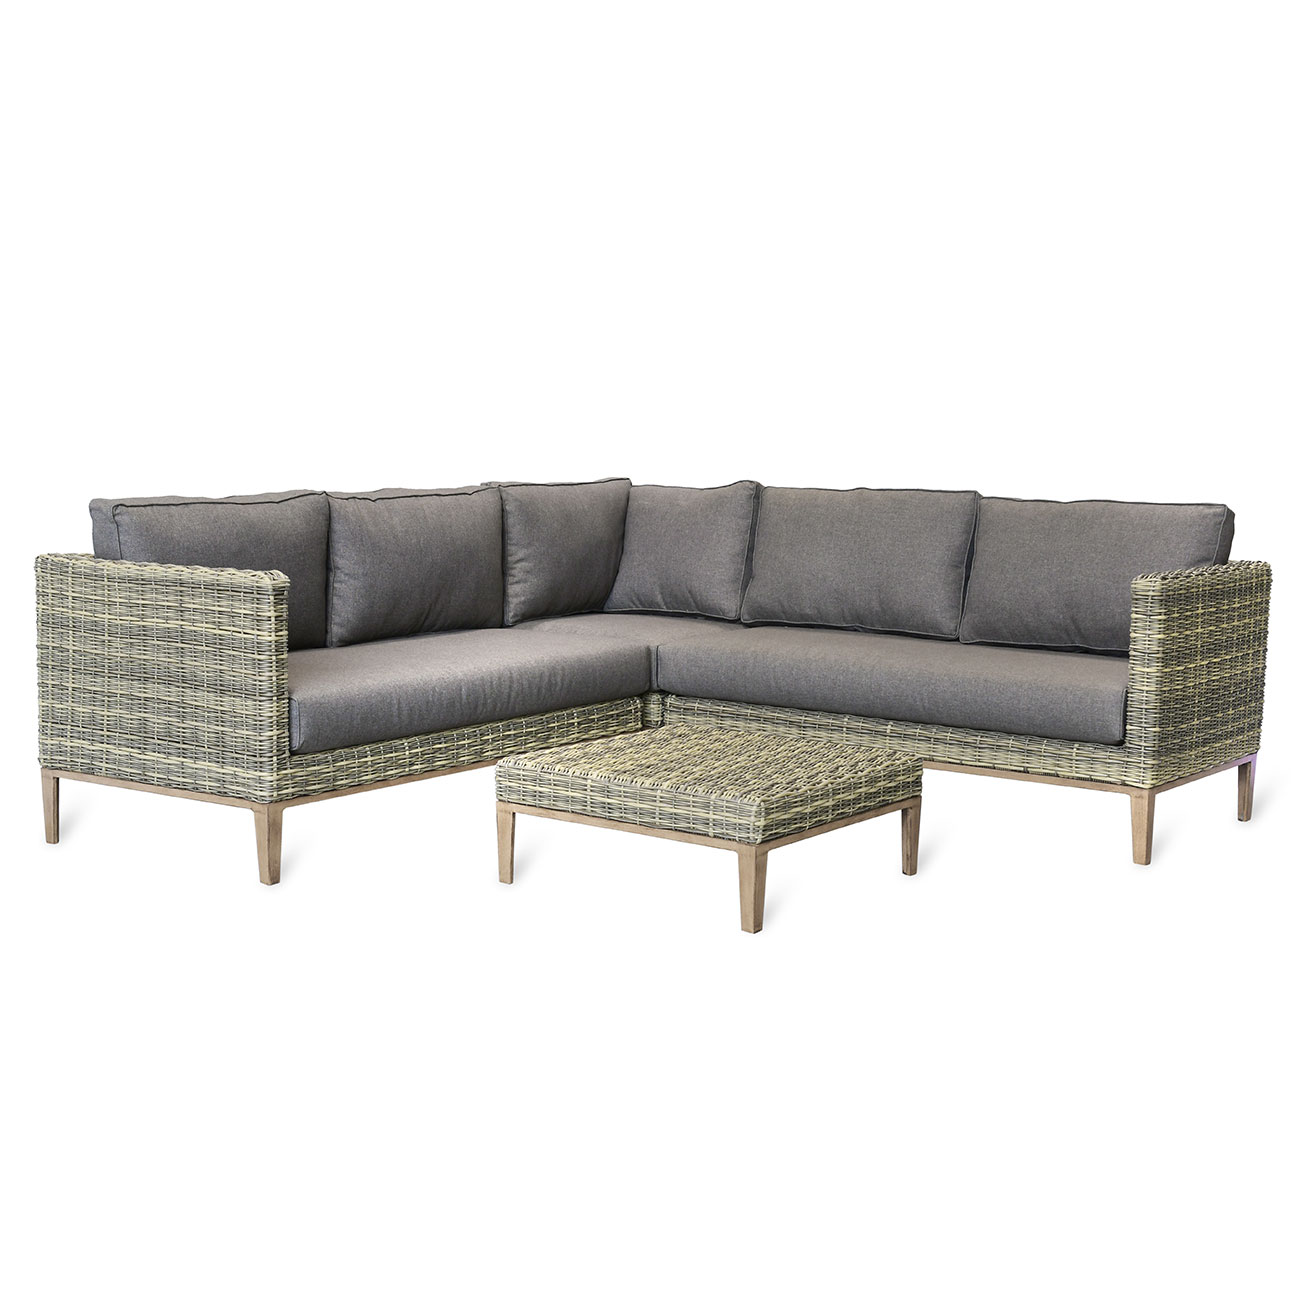 Fabulous Walderton Corner Sofa Set Andrewgaddart Wooden Chair Designs For Living Room Andrewgaddartcom